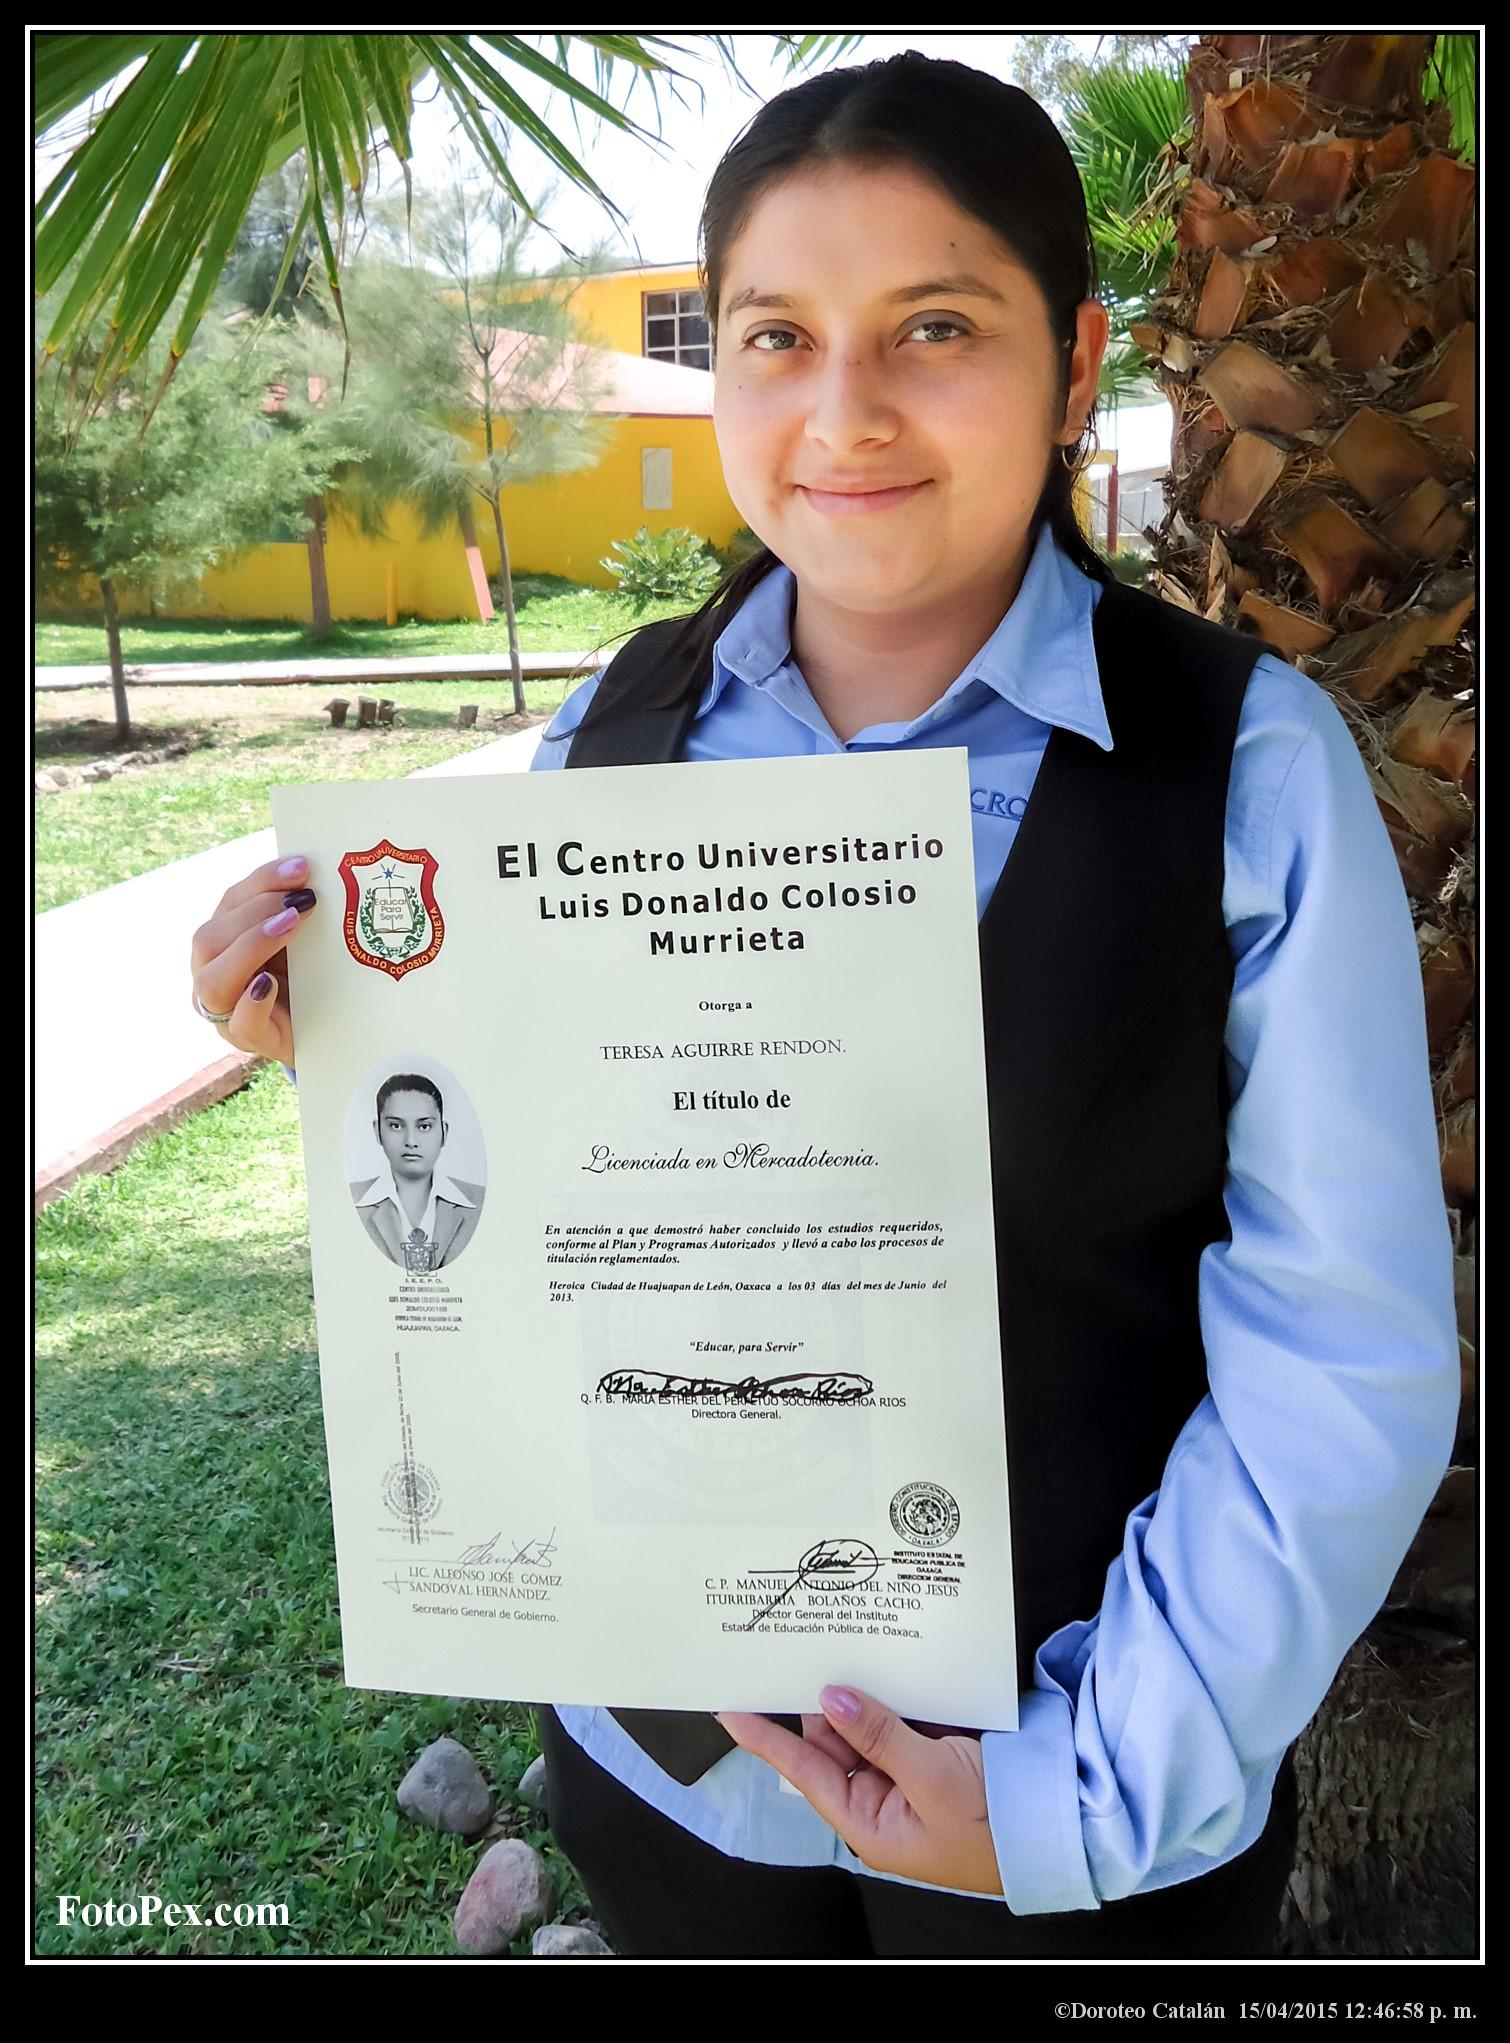 Lic. Teresa Aguirre Rendón